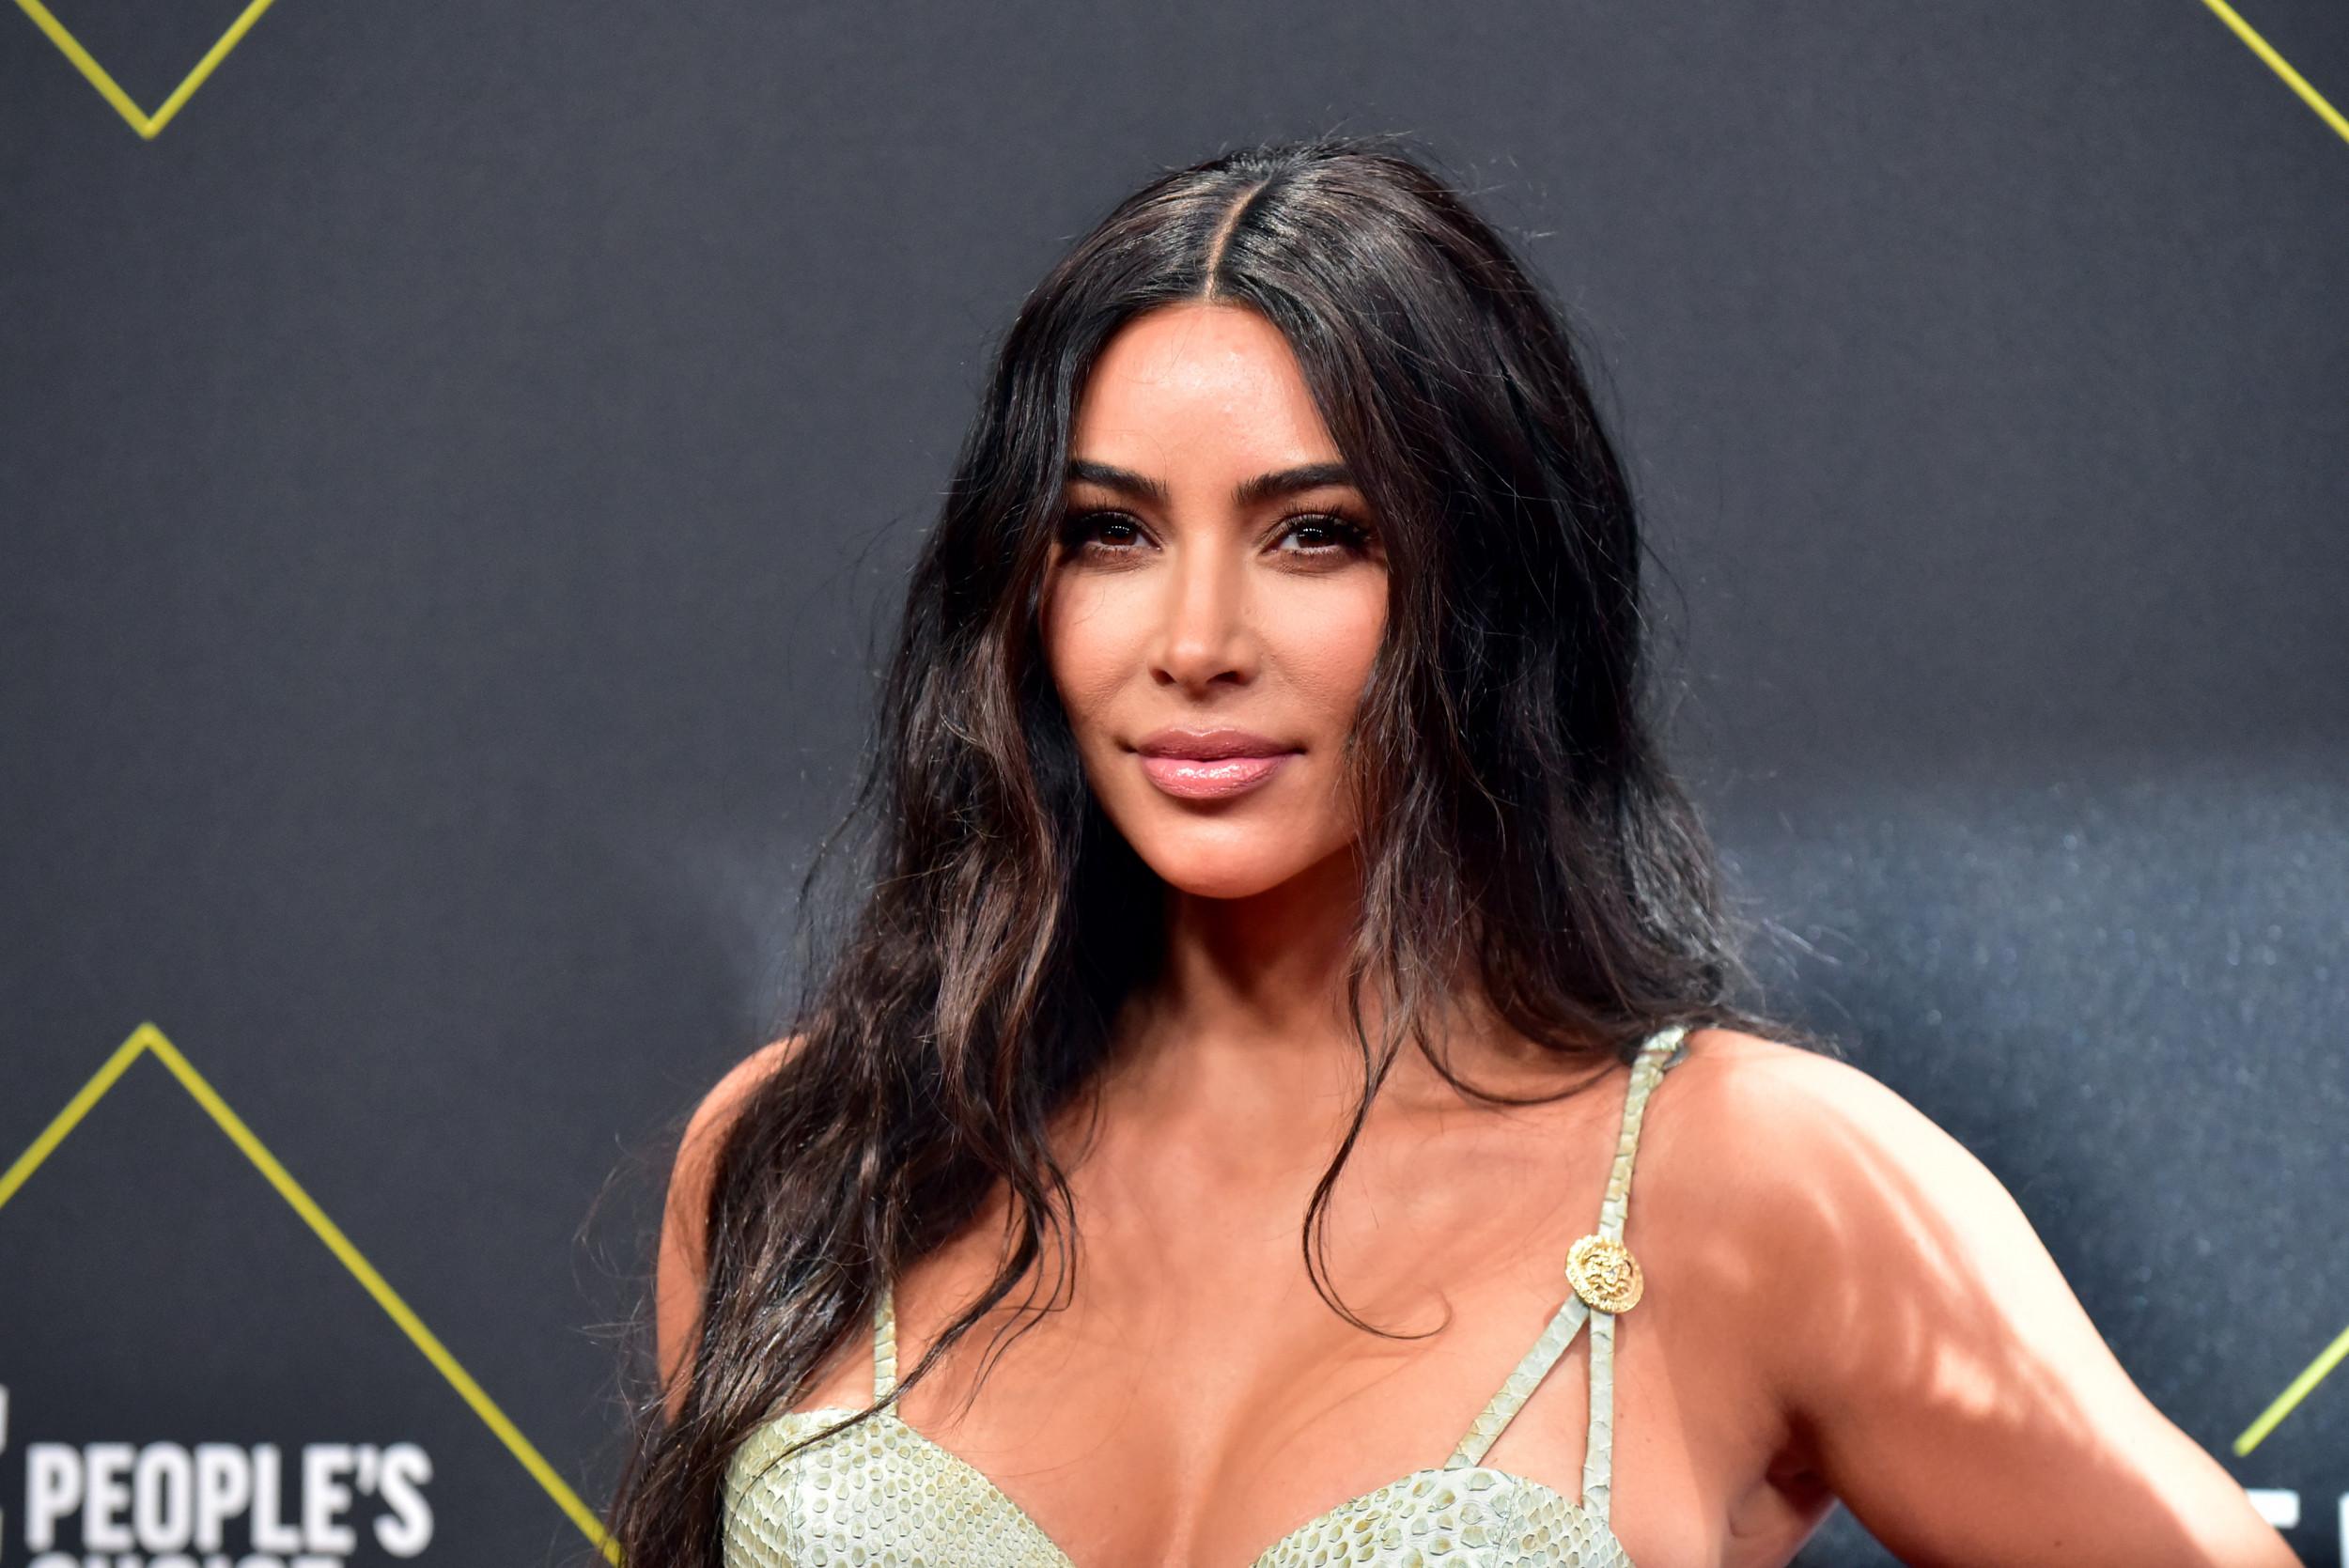 Did Kim Kardashian Have Coronavirus?